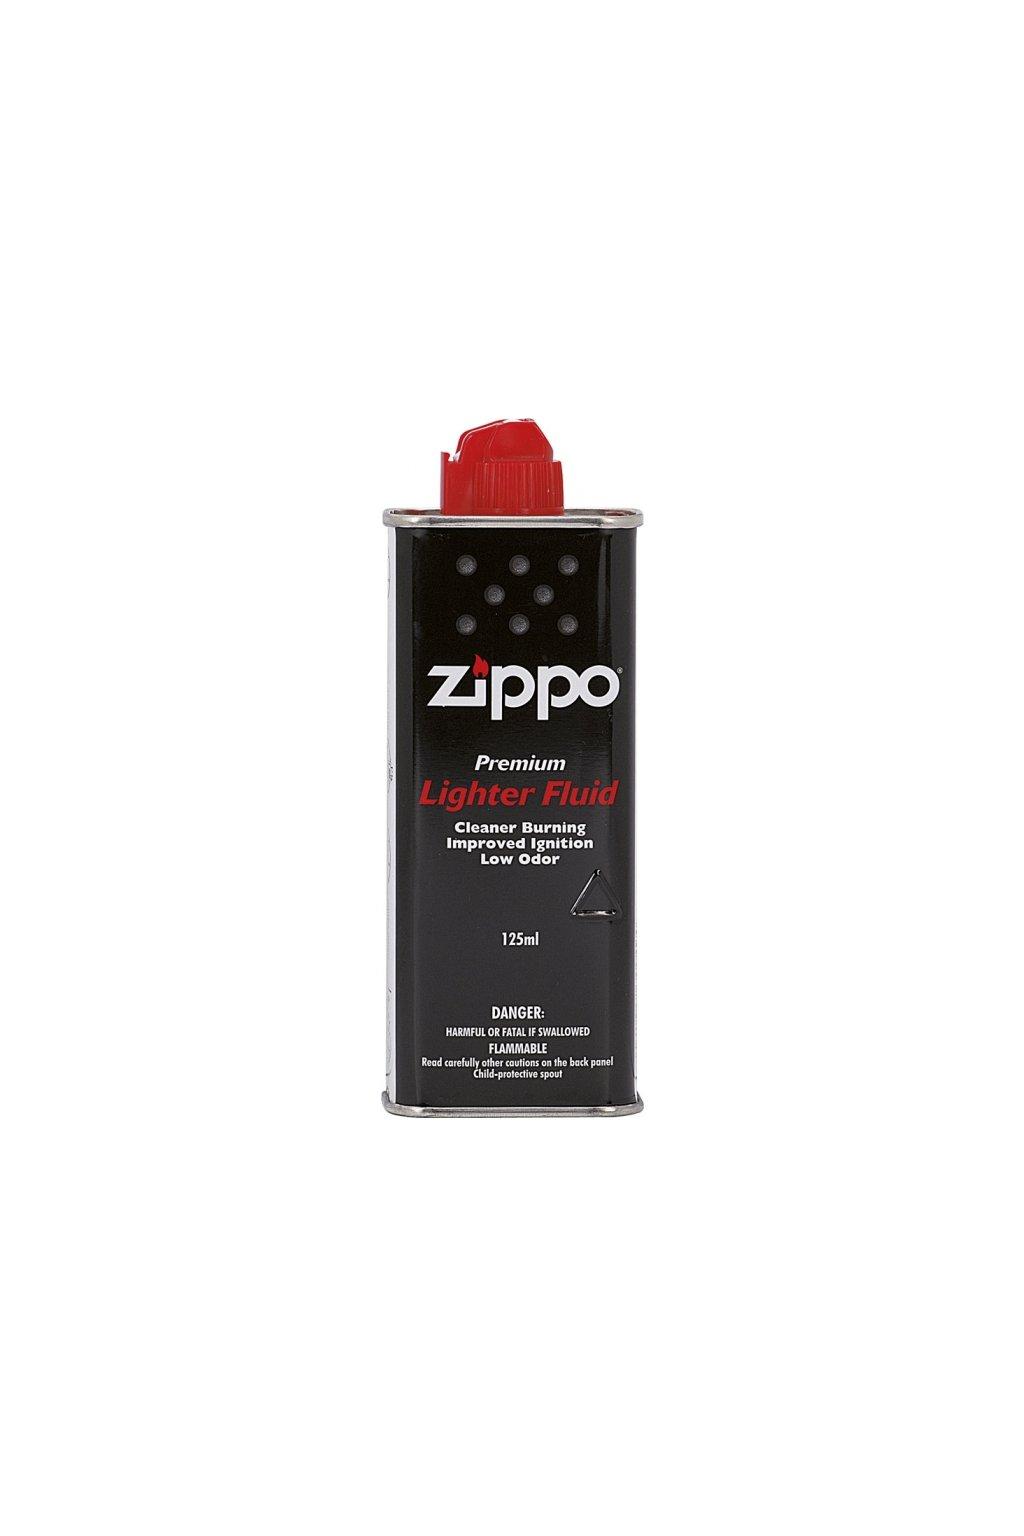 7 zippo 355 product detail main